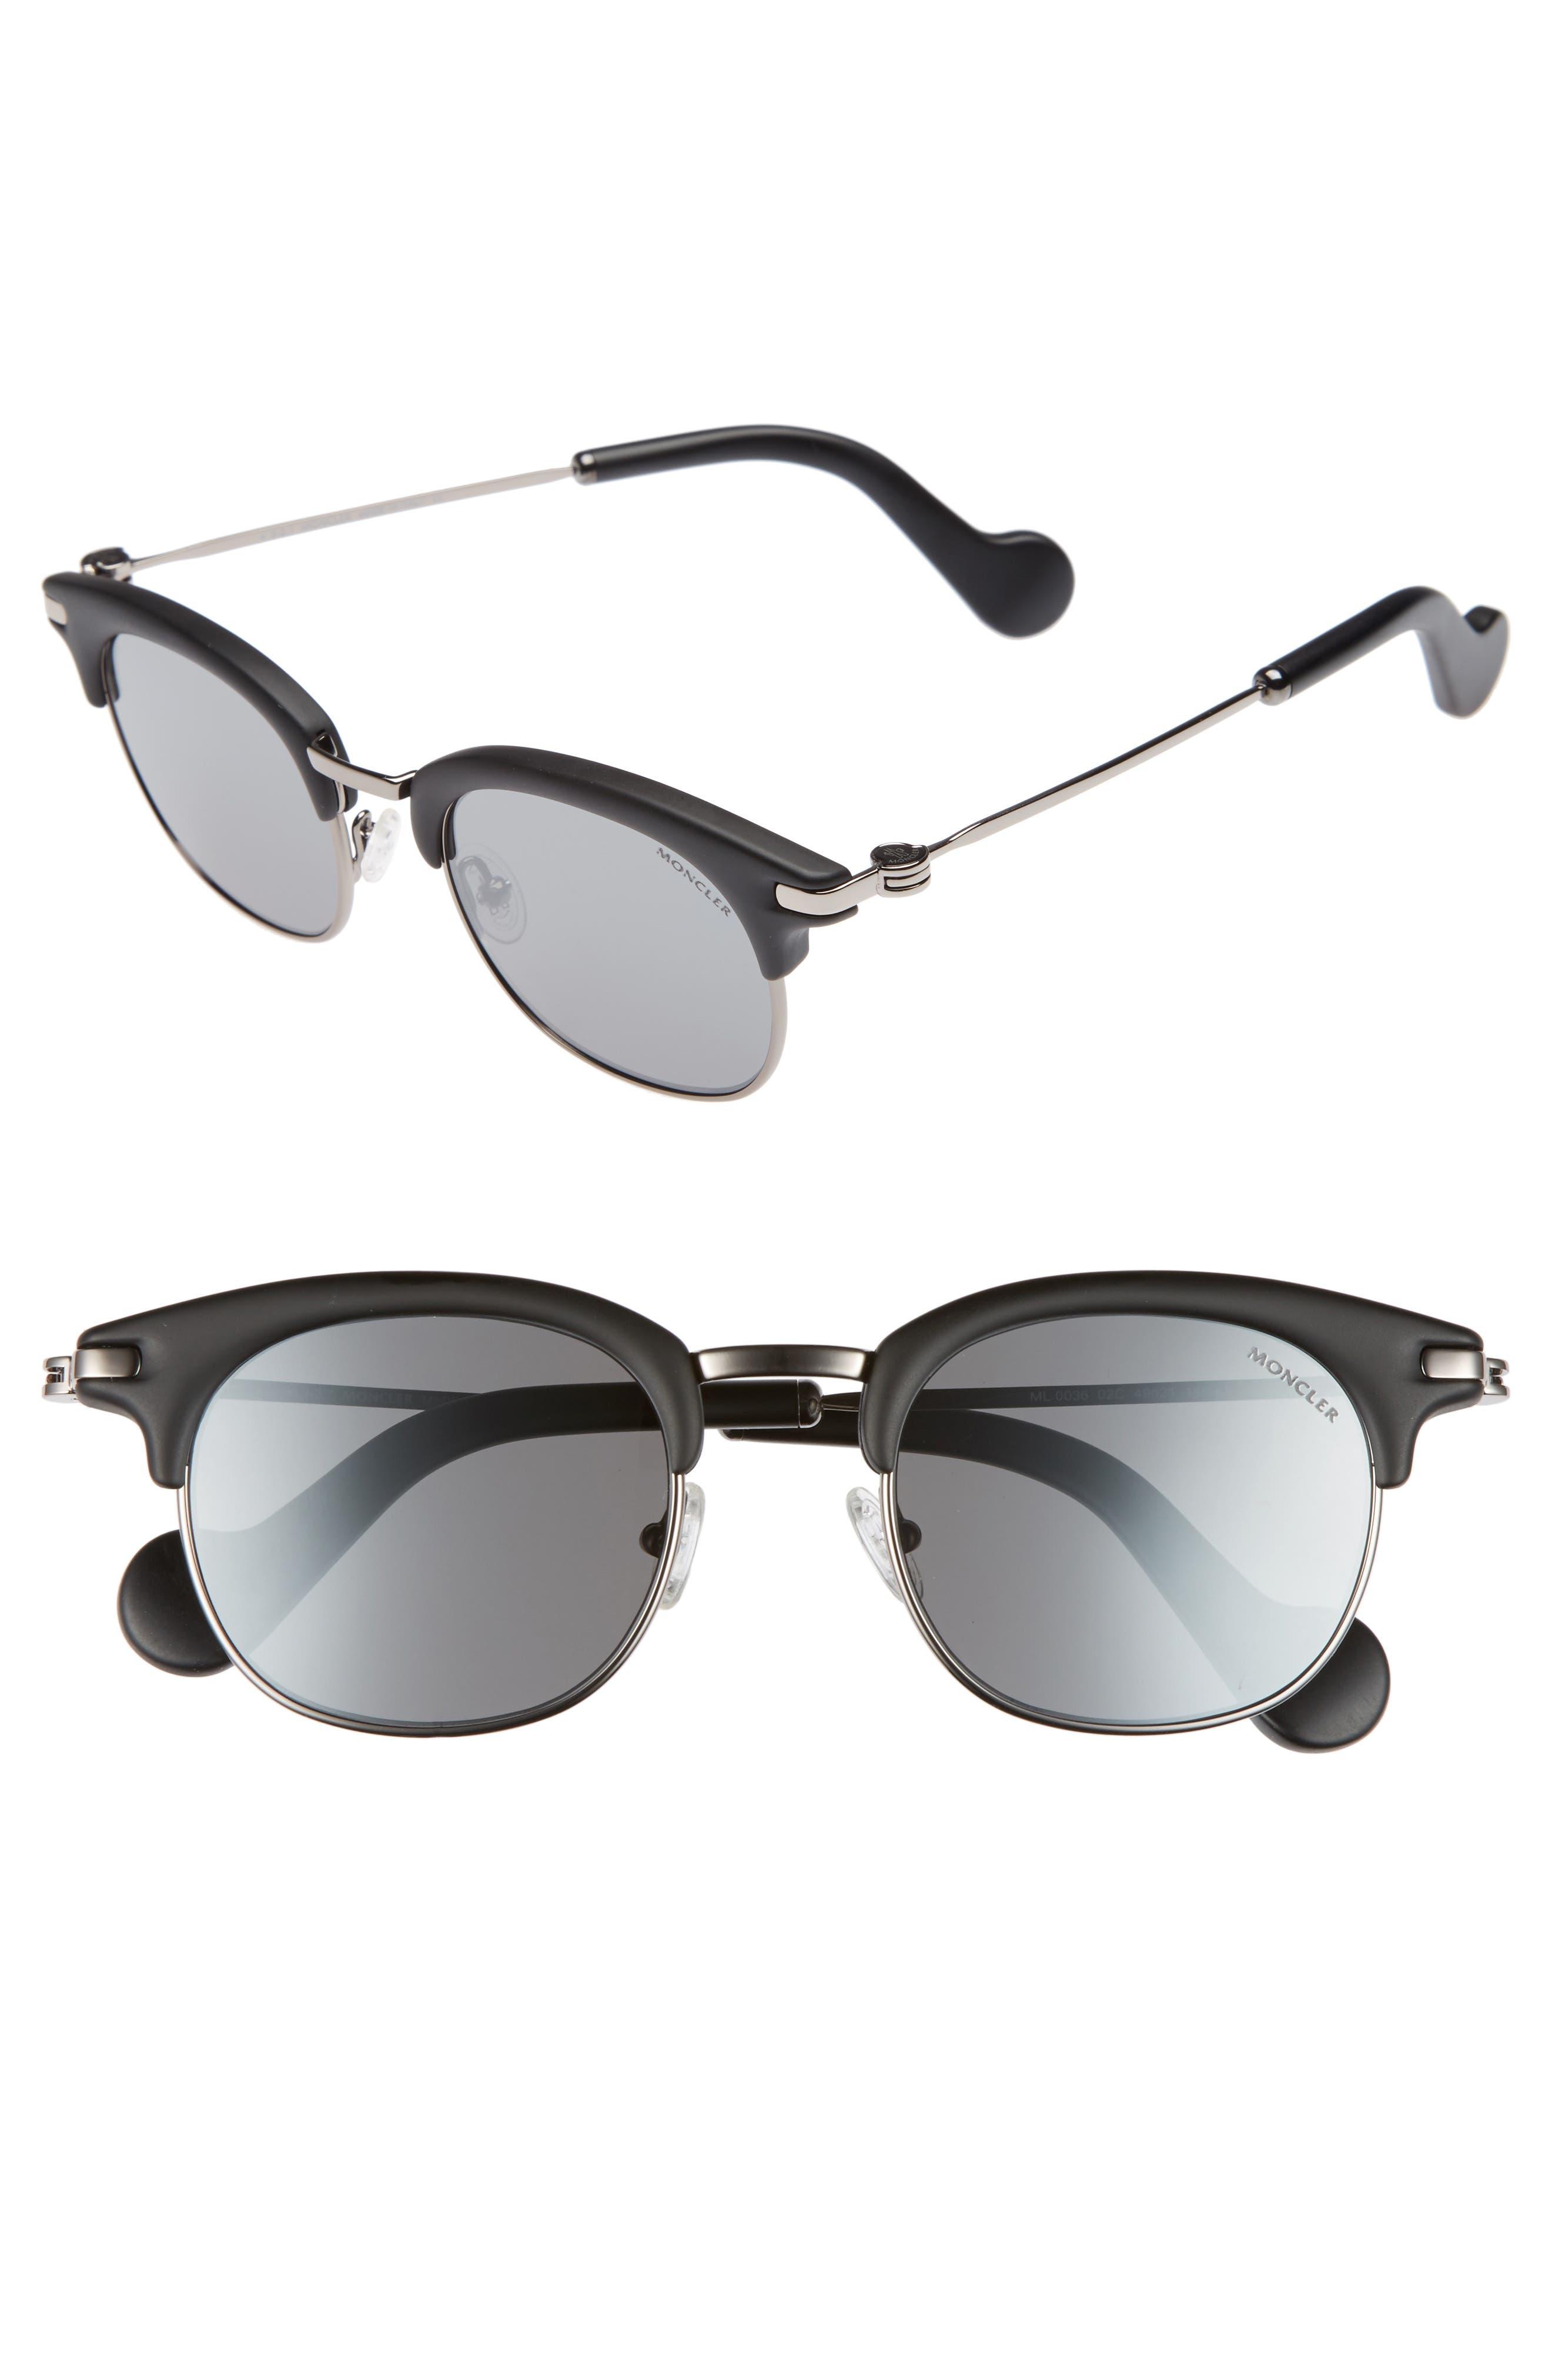 49mm Wayfarer Sunglasses,                         Main,                         color, Matte Black/ Ruthenium